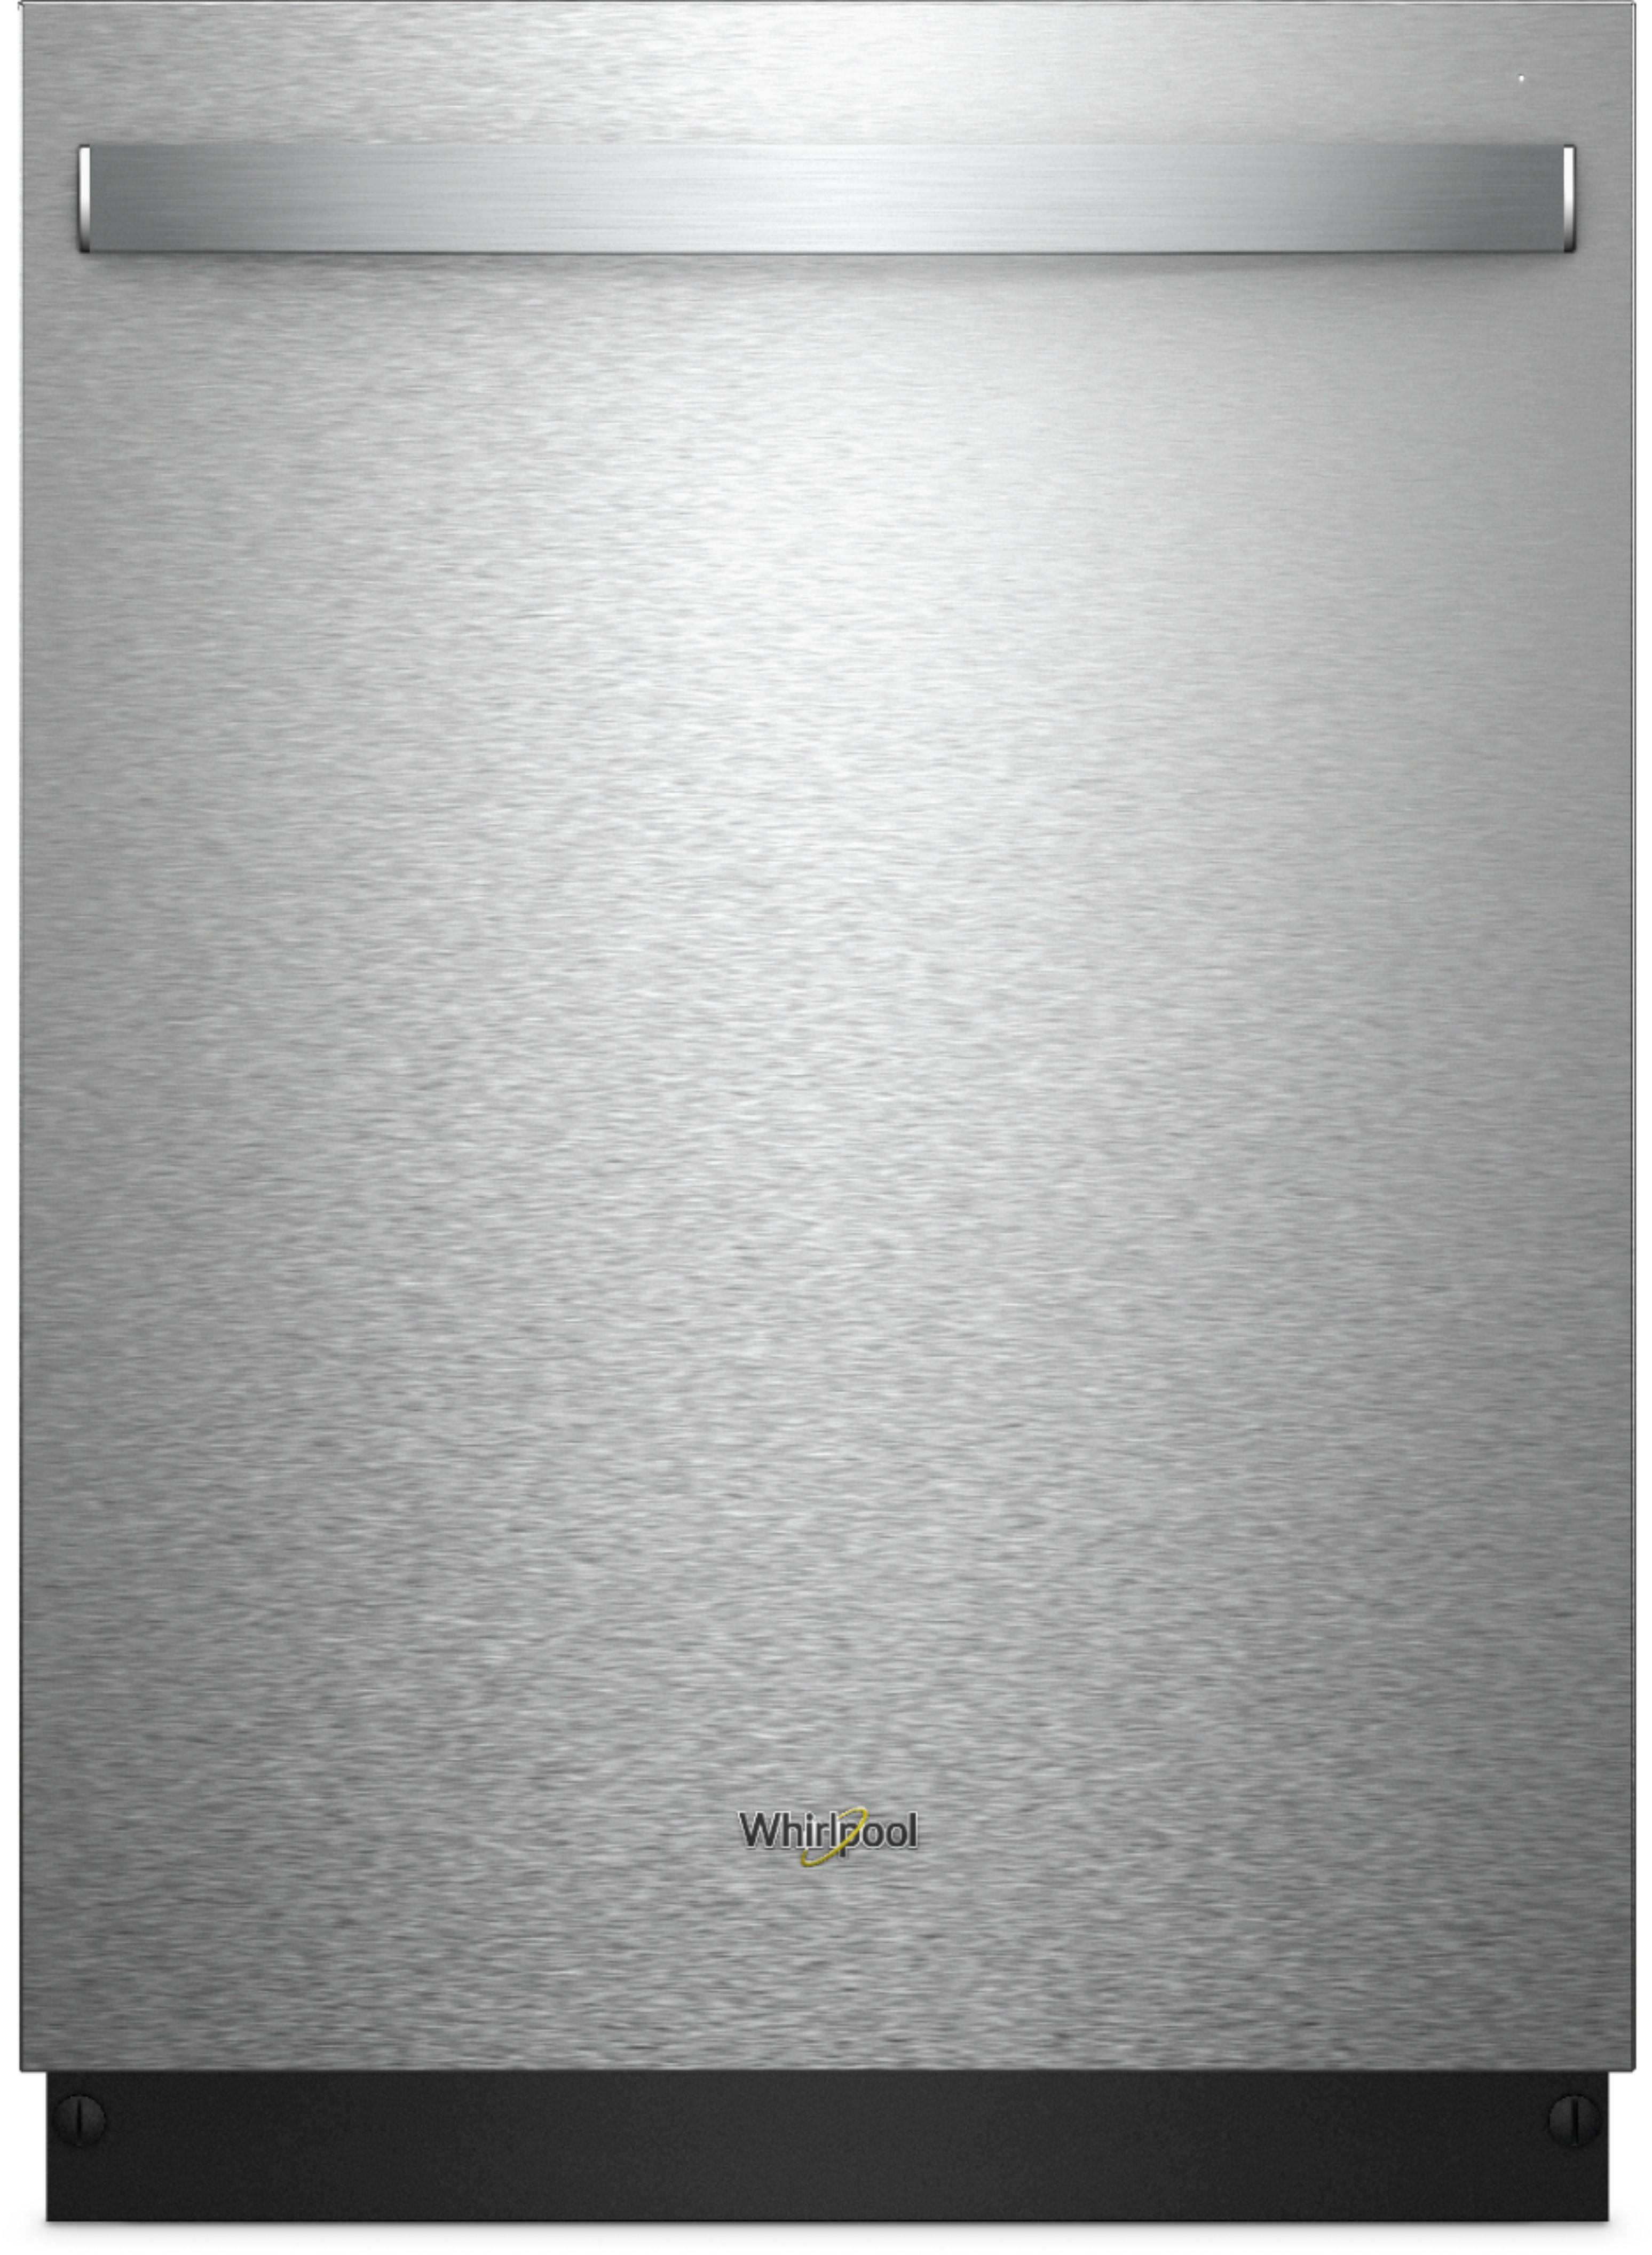 "Whirlpool WDT750SAHZ 24"" Built-In Dishwasher Stainless steel"